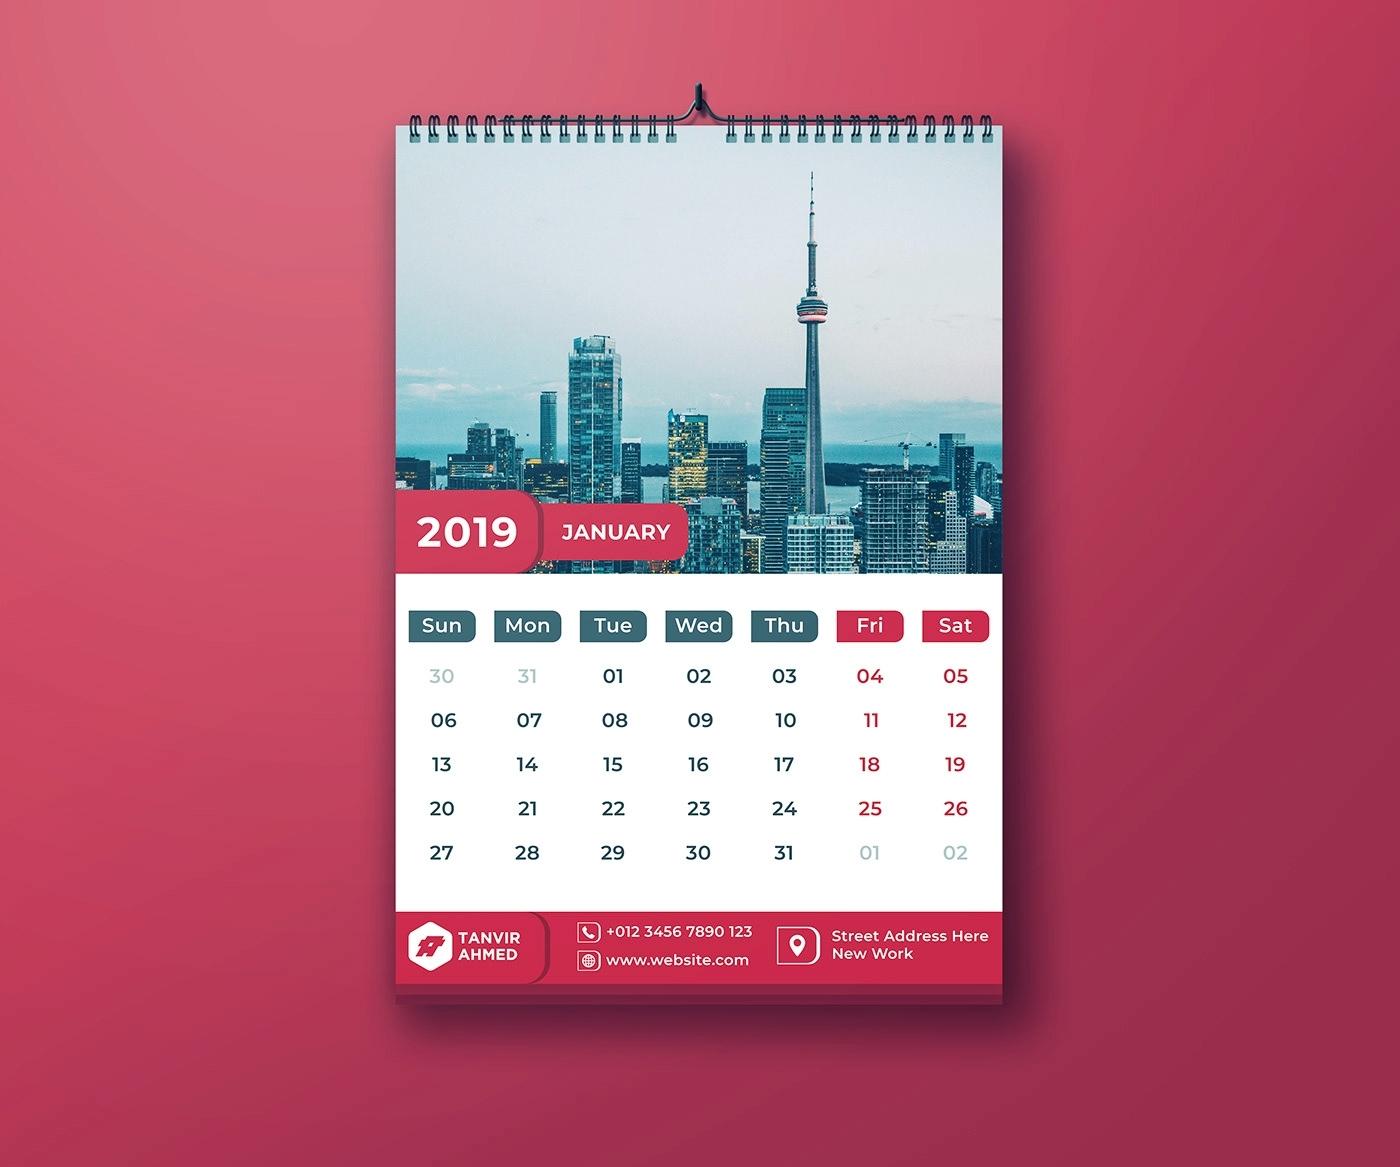 Wall Calendar 2019 | Free Psd Template | Psd Repo